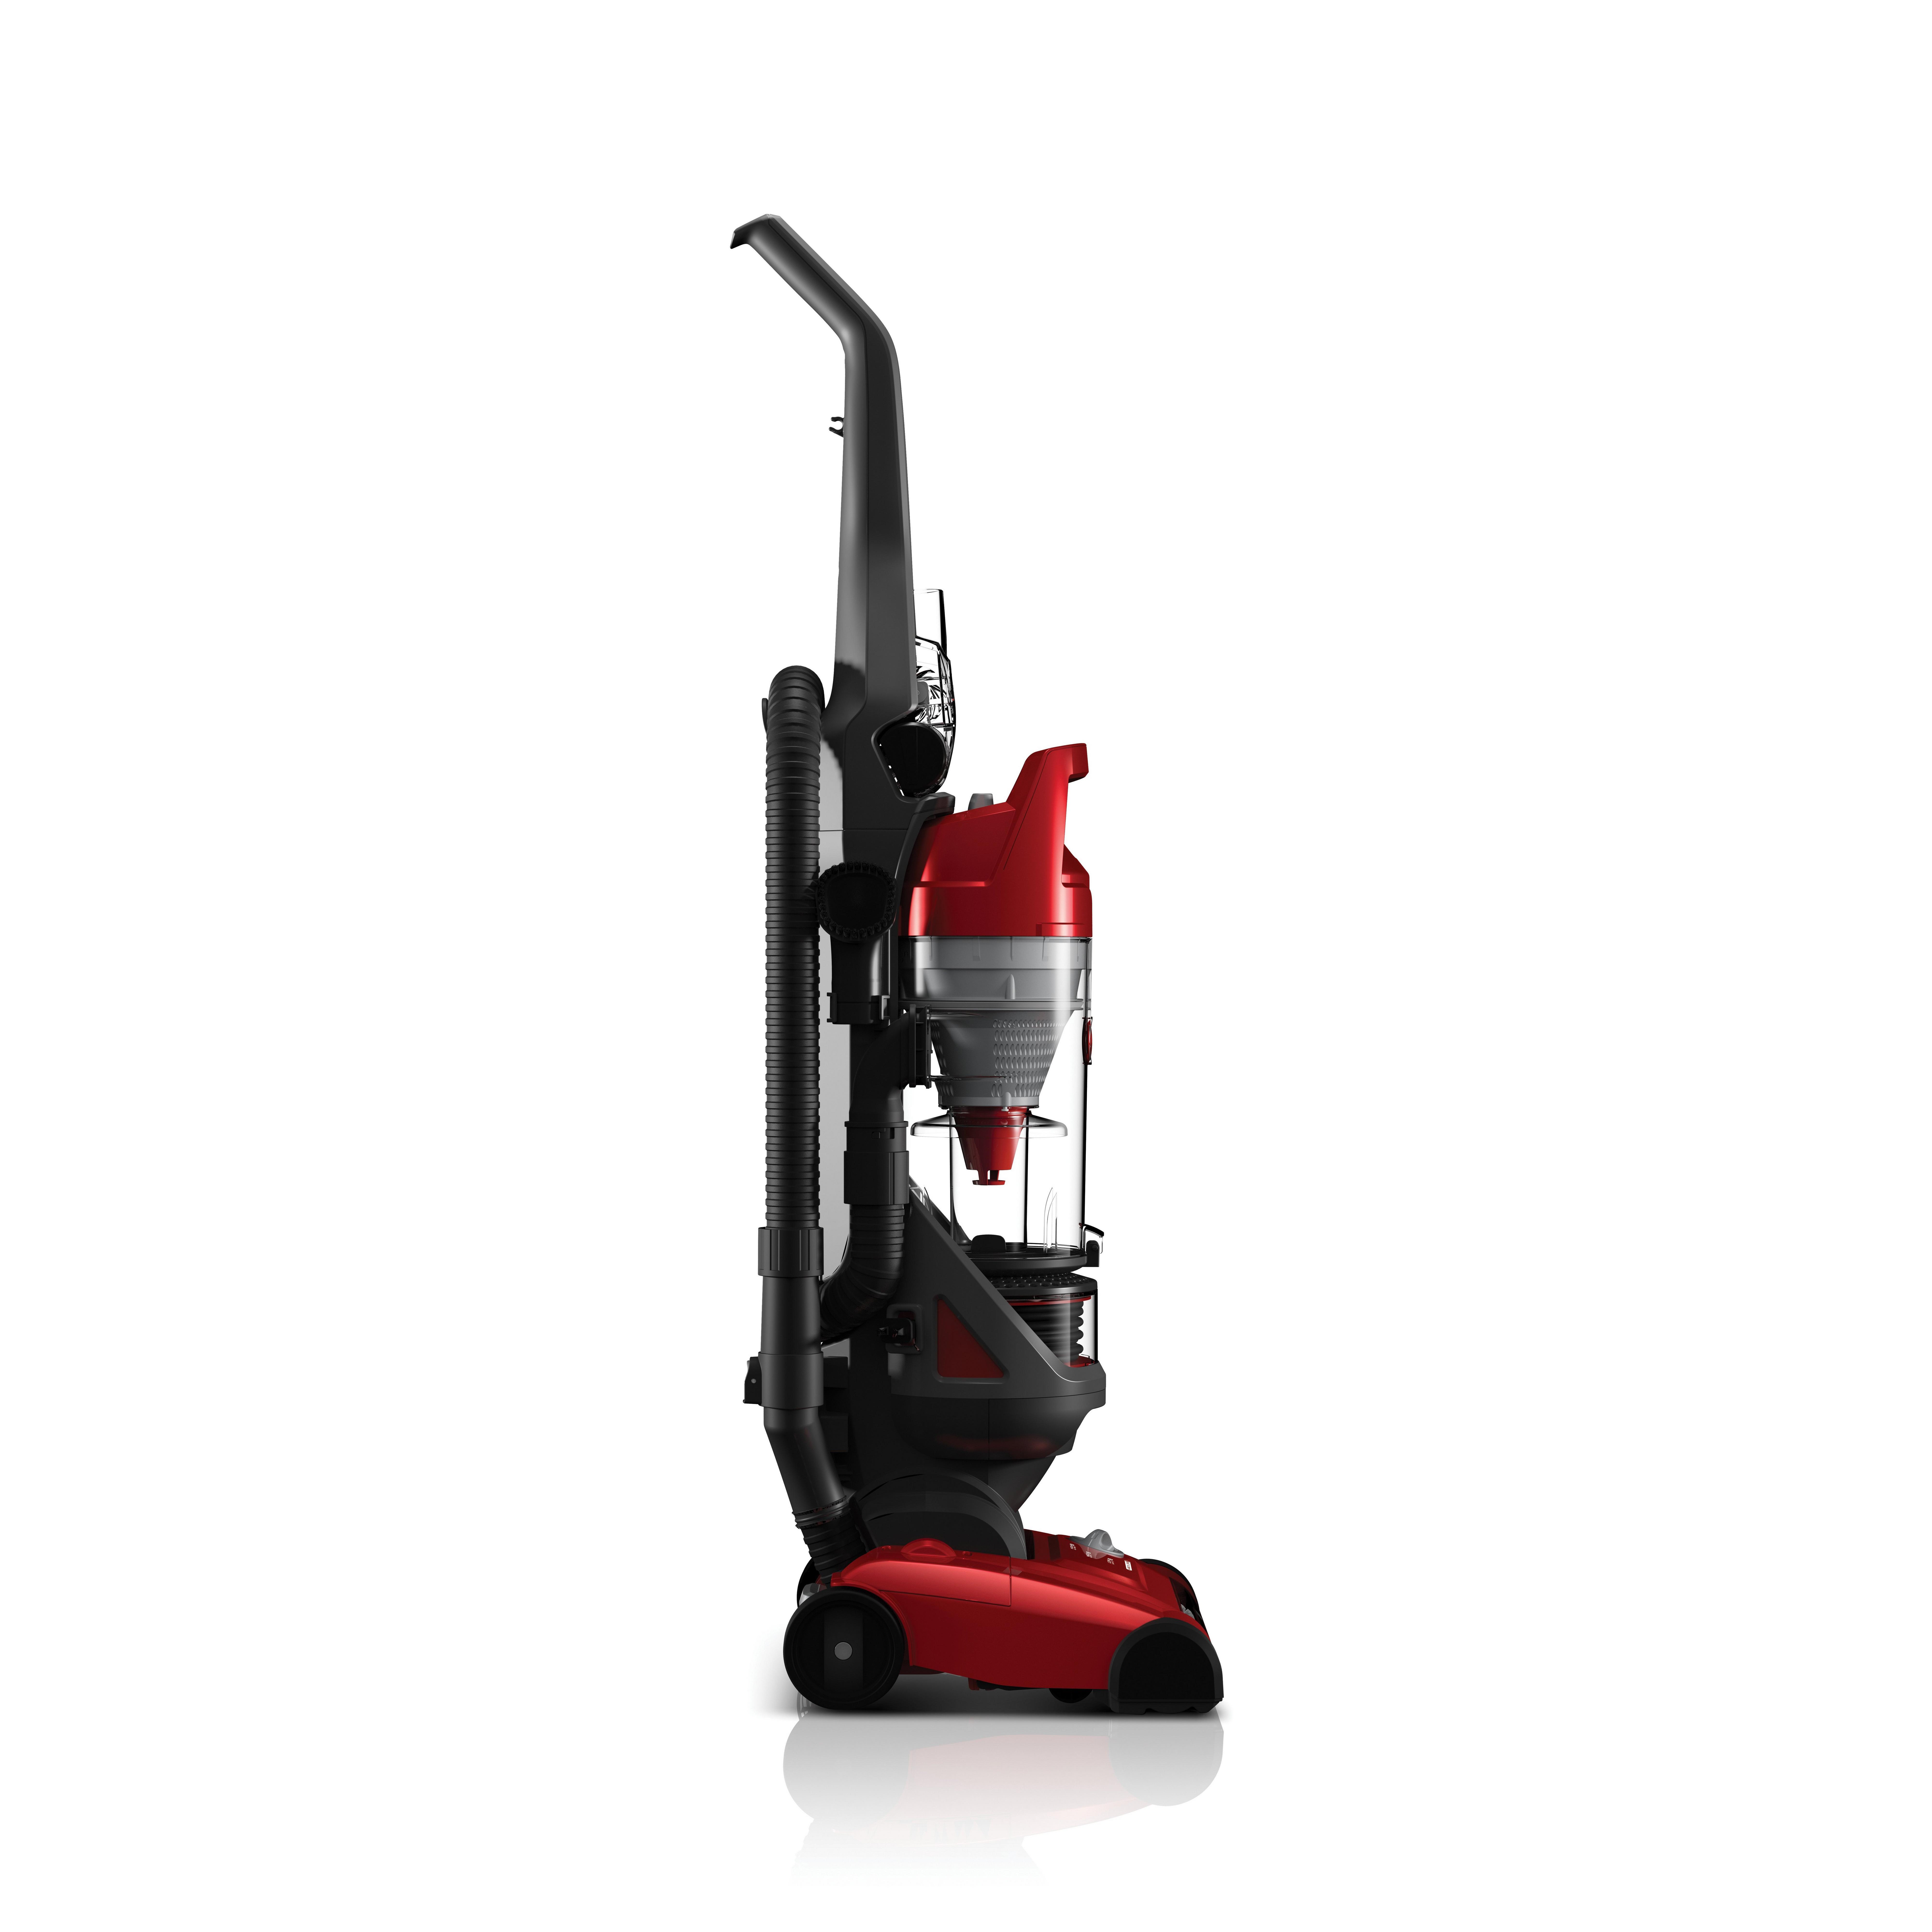 Hoover-Elite-Rewind-Upright-Vacuum-Cleaner-Damaged-Box-UH71012DM thumbnail 4